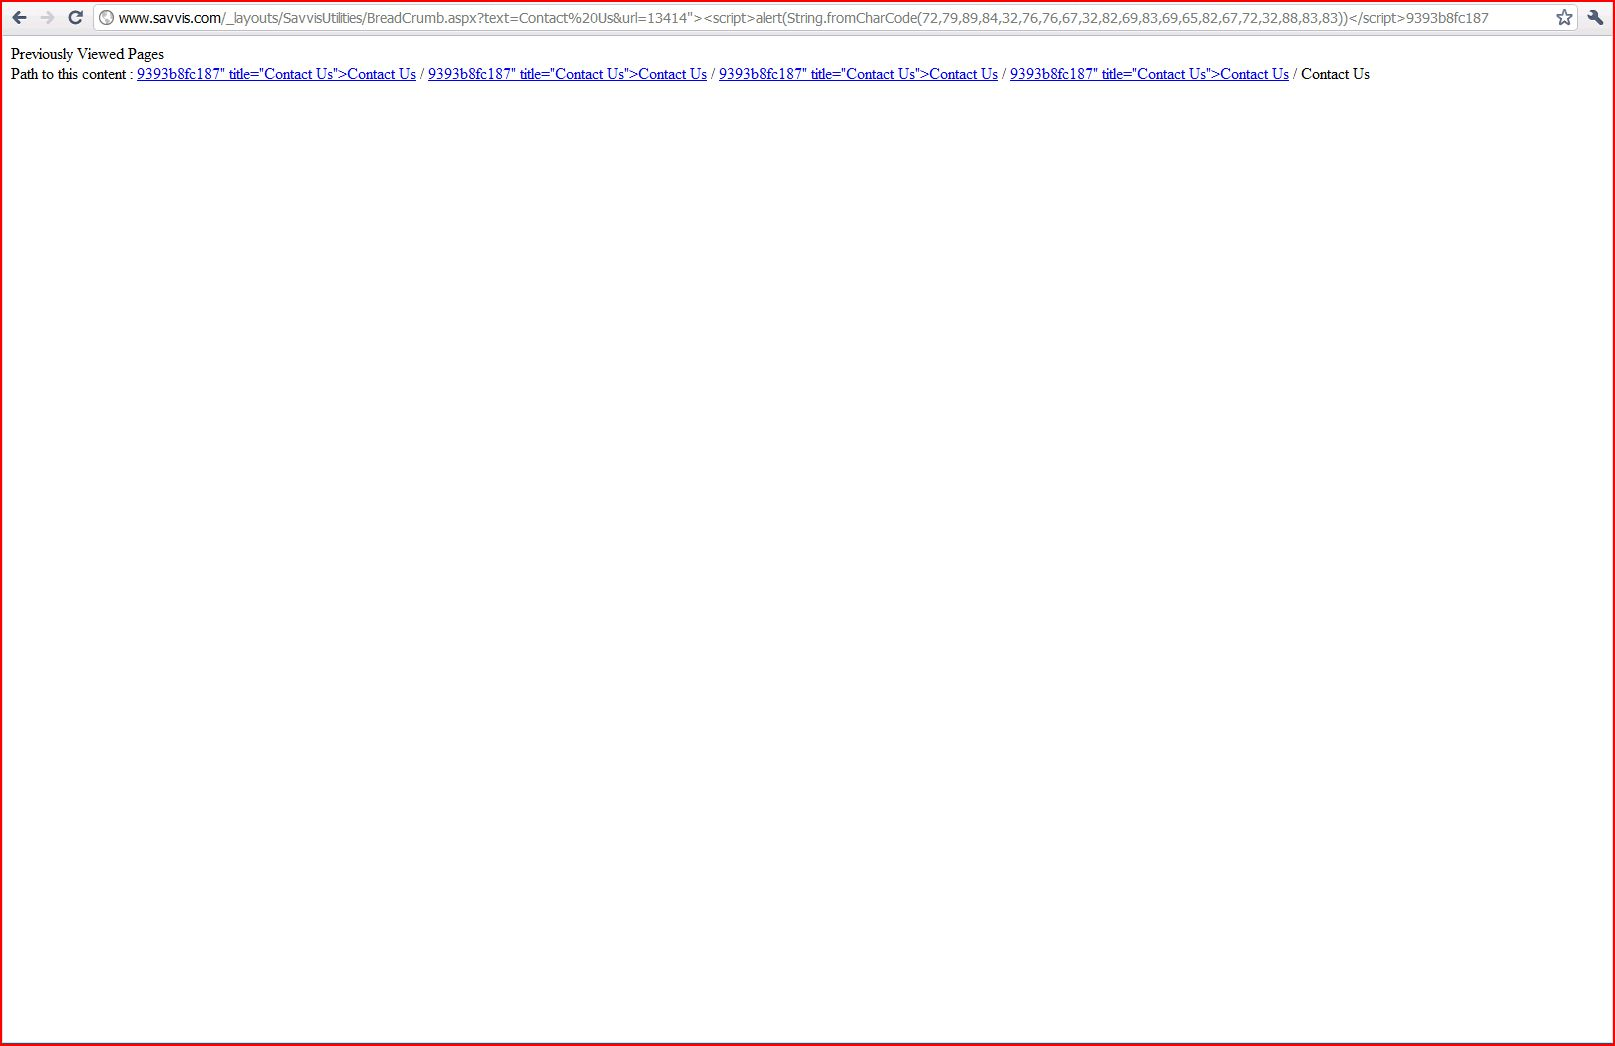 Stored XSS in savvis.com, DORK, Cross Site Scripting, CWE-79, CAPEC-86